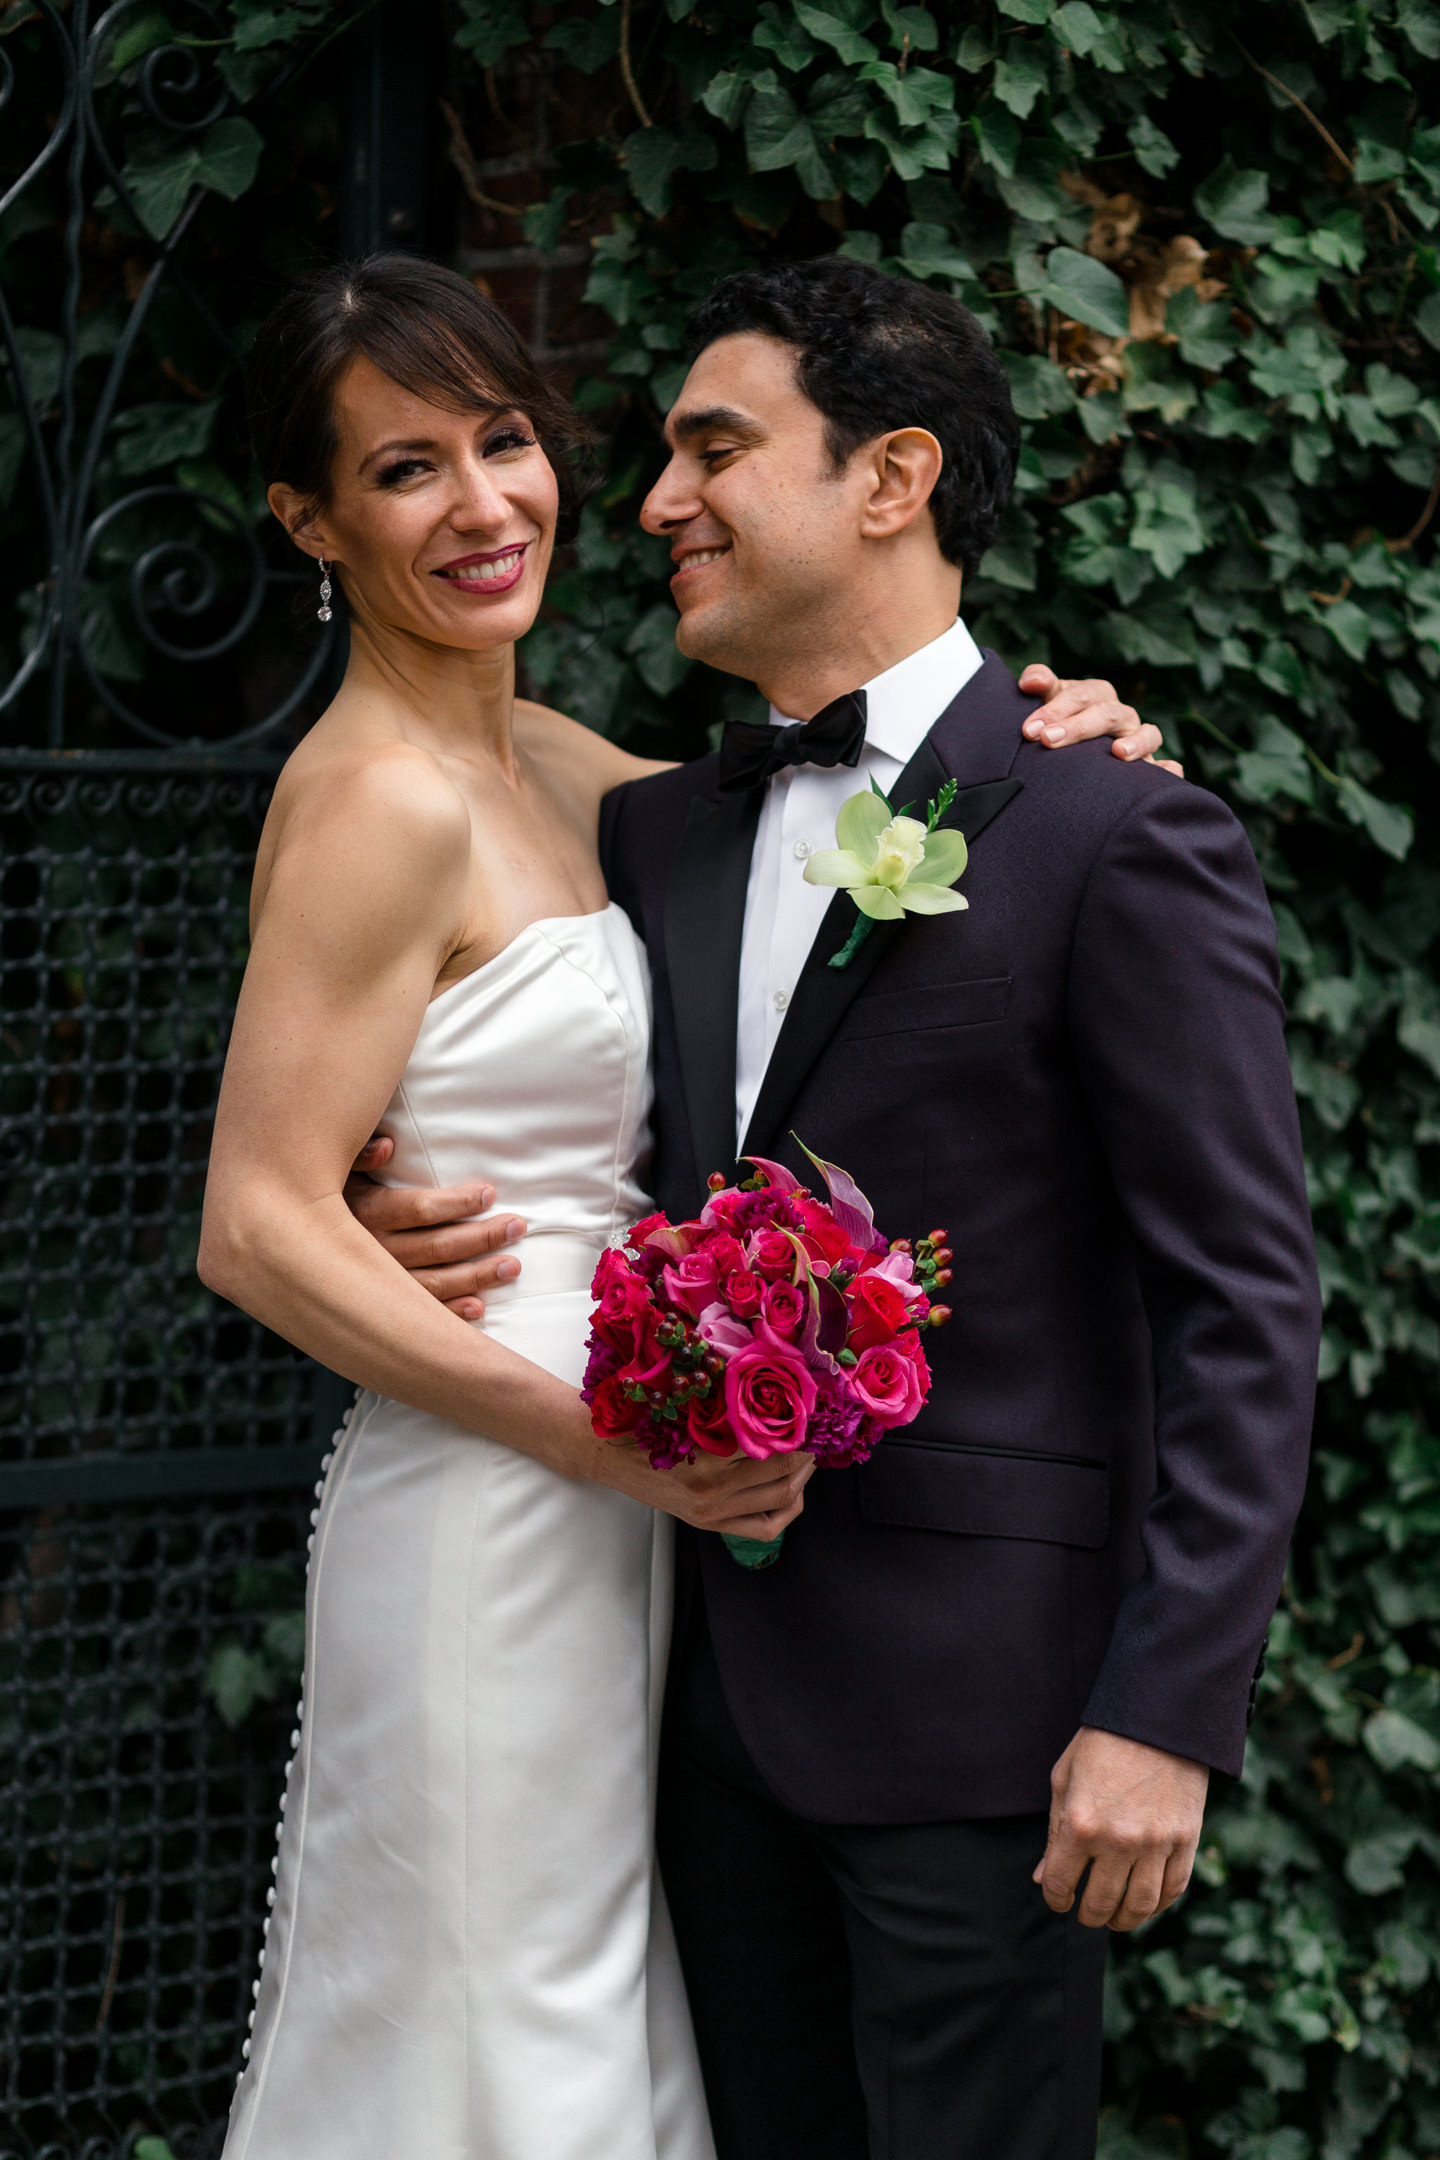 Documentary-Wedding-Photography-Andrew-Tat-Maria & AJ-03.jpg